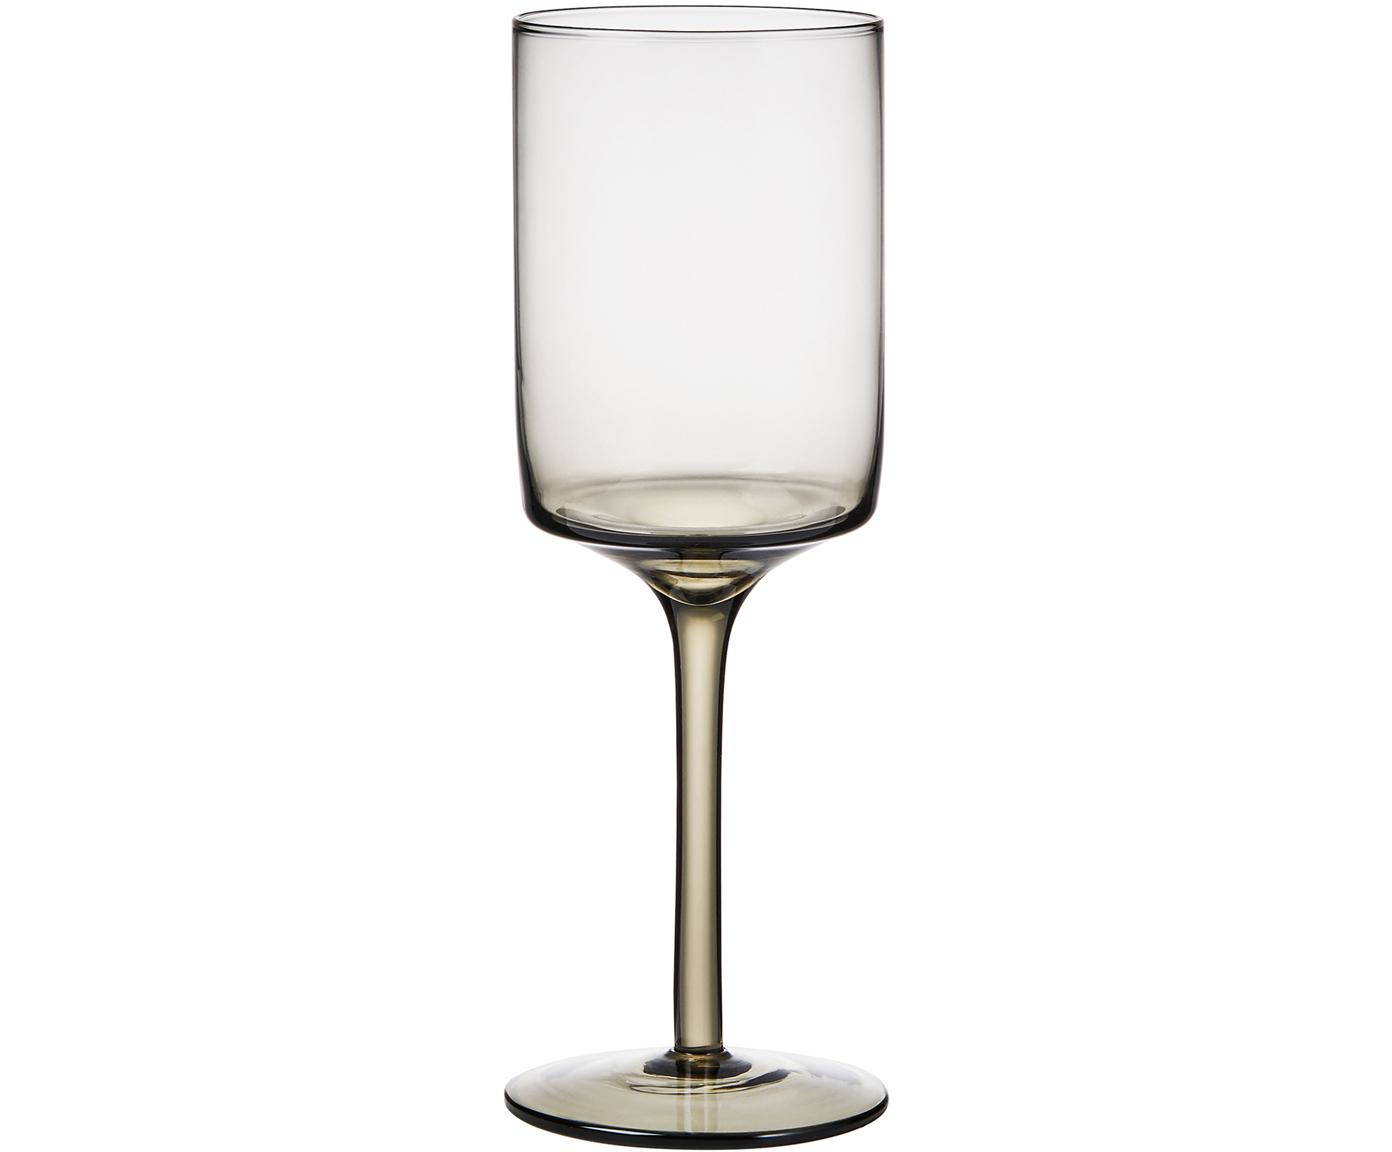 Copas de vino Savor, 4uds., Vidrio, Gris antracita, Ø 8 x Al 23 cm